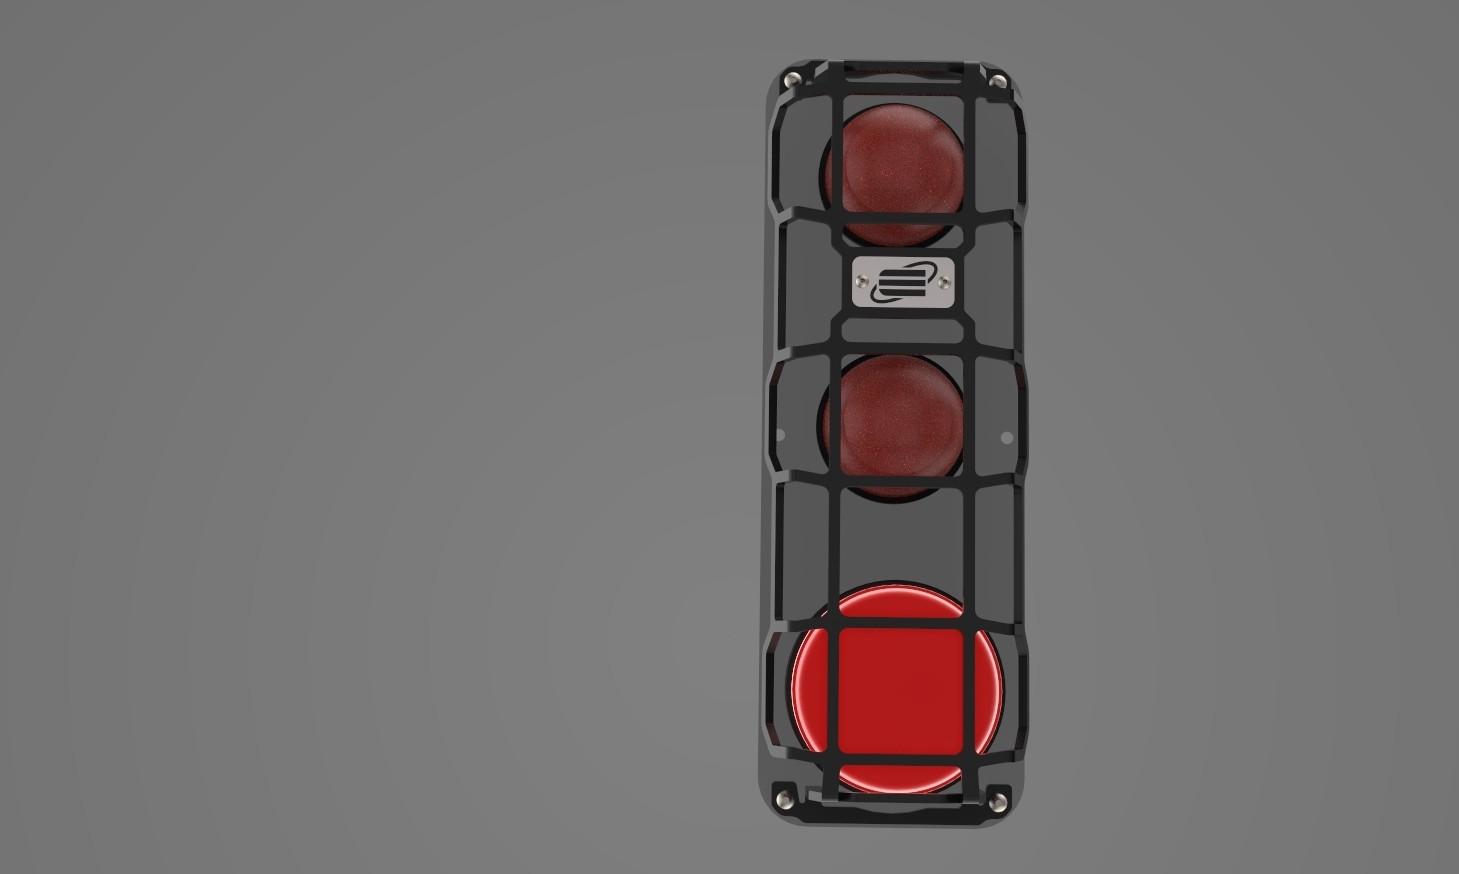 Rear indicator, rear light / rear fog light protection for Defender HCPU 110/130, black powder coated.